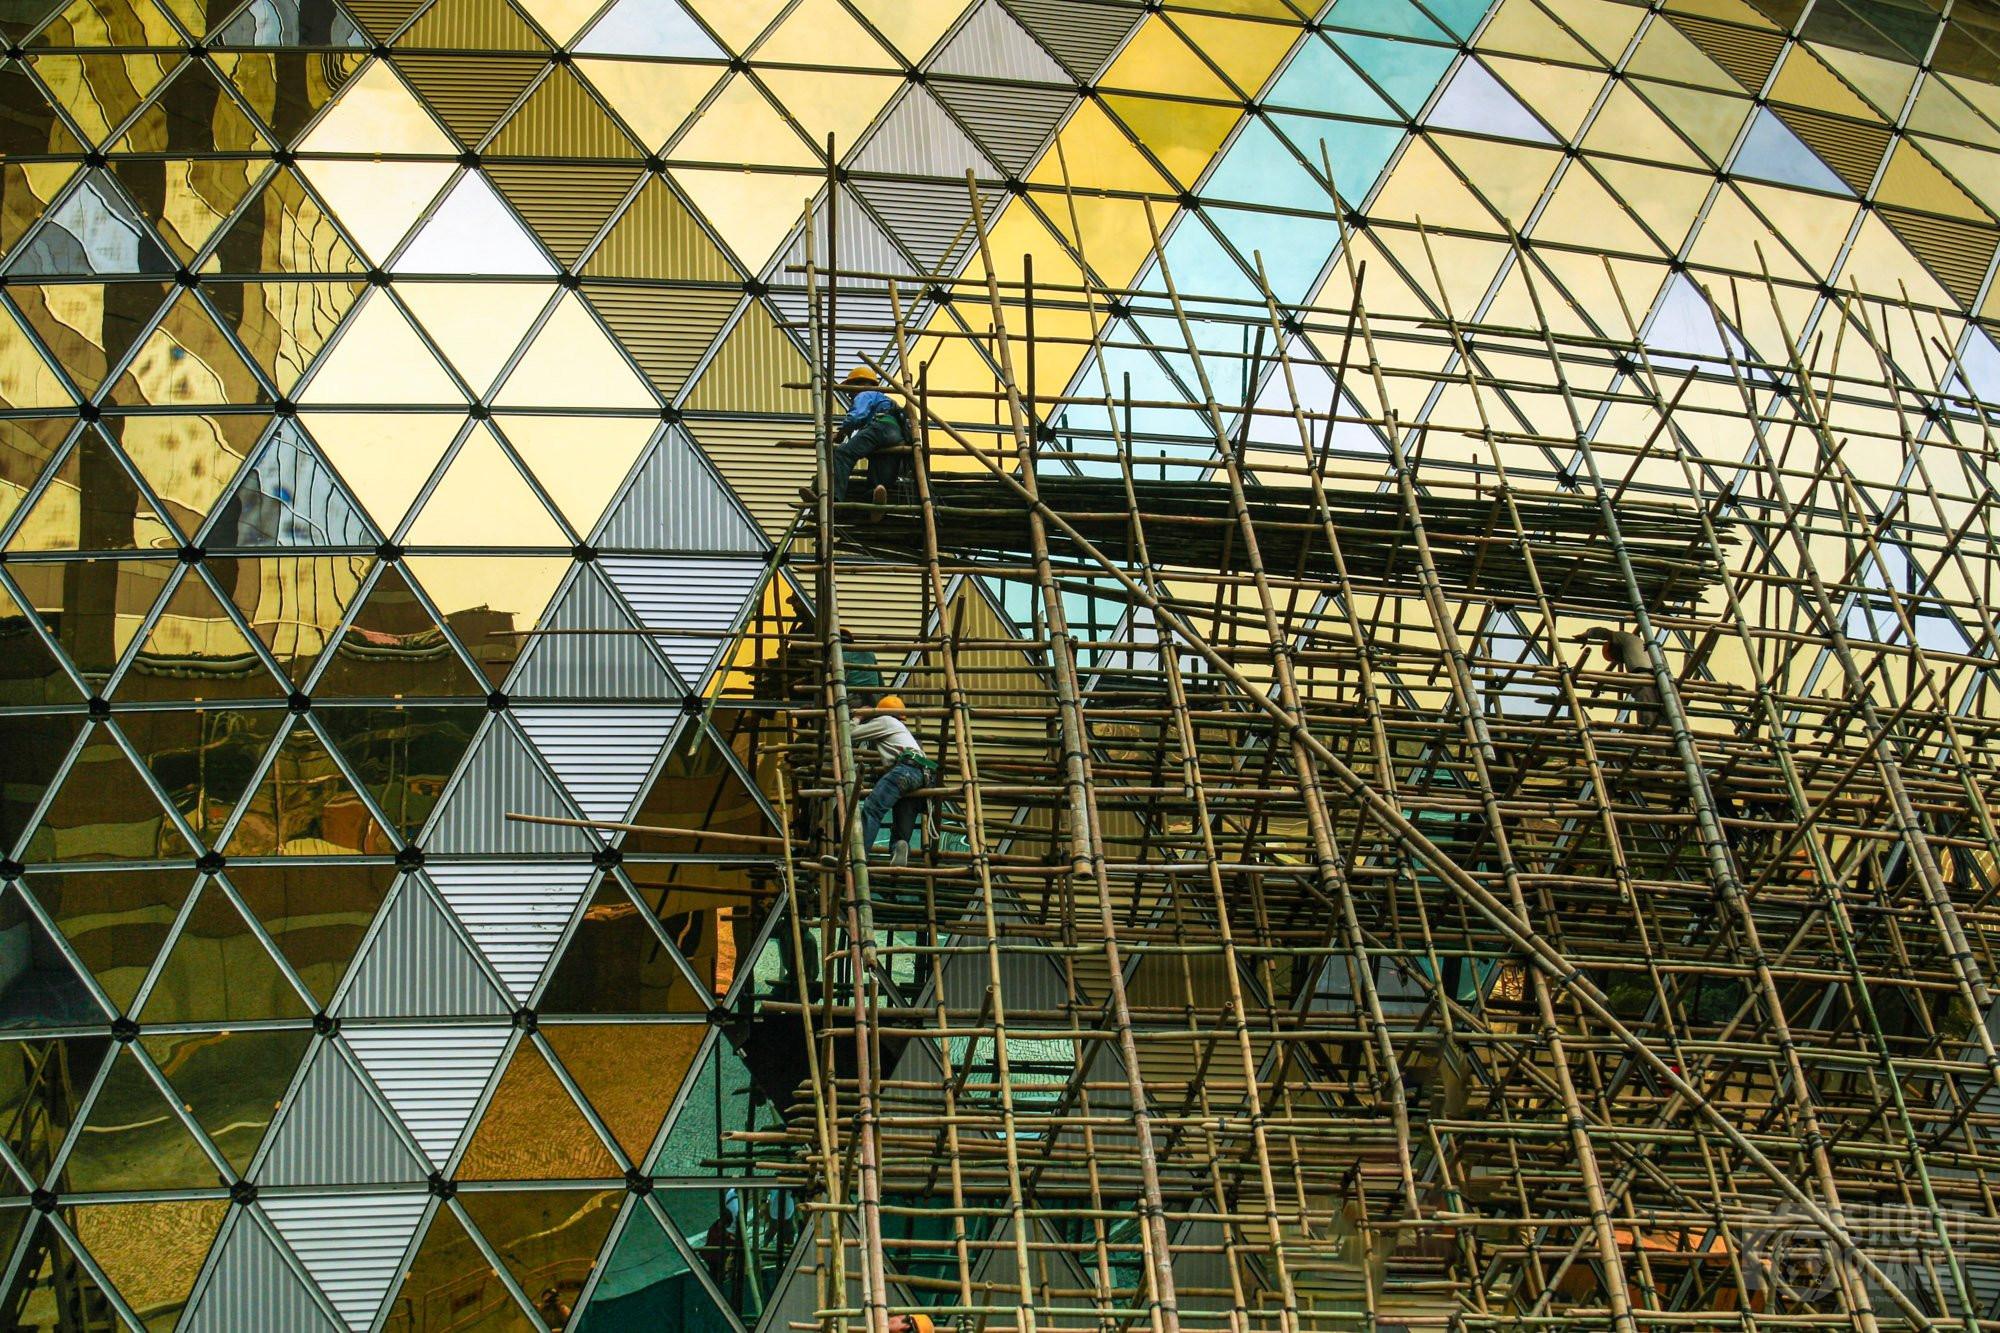 Grand Lisboa construction scaffolding, Macao China